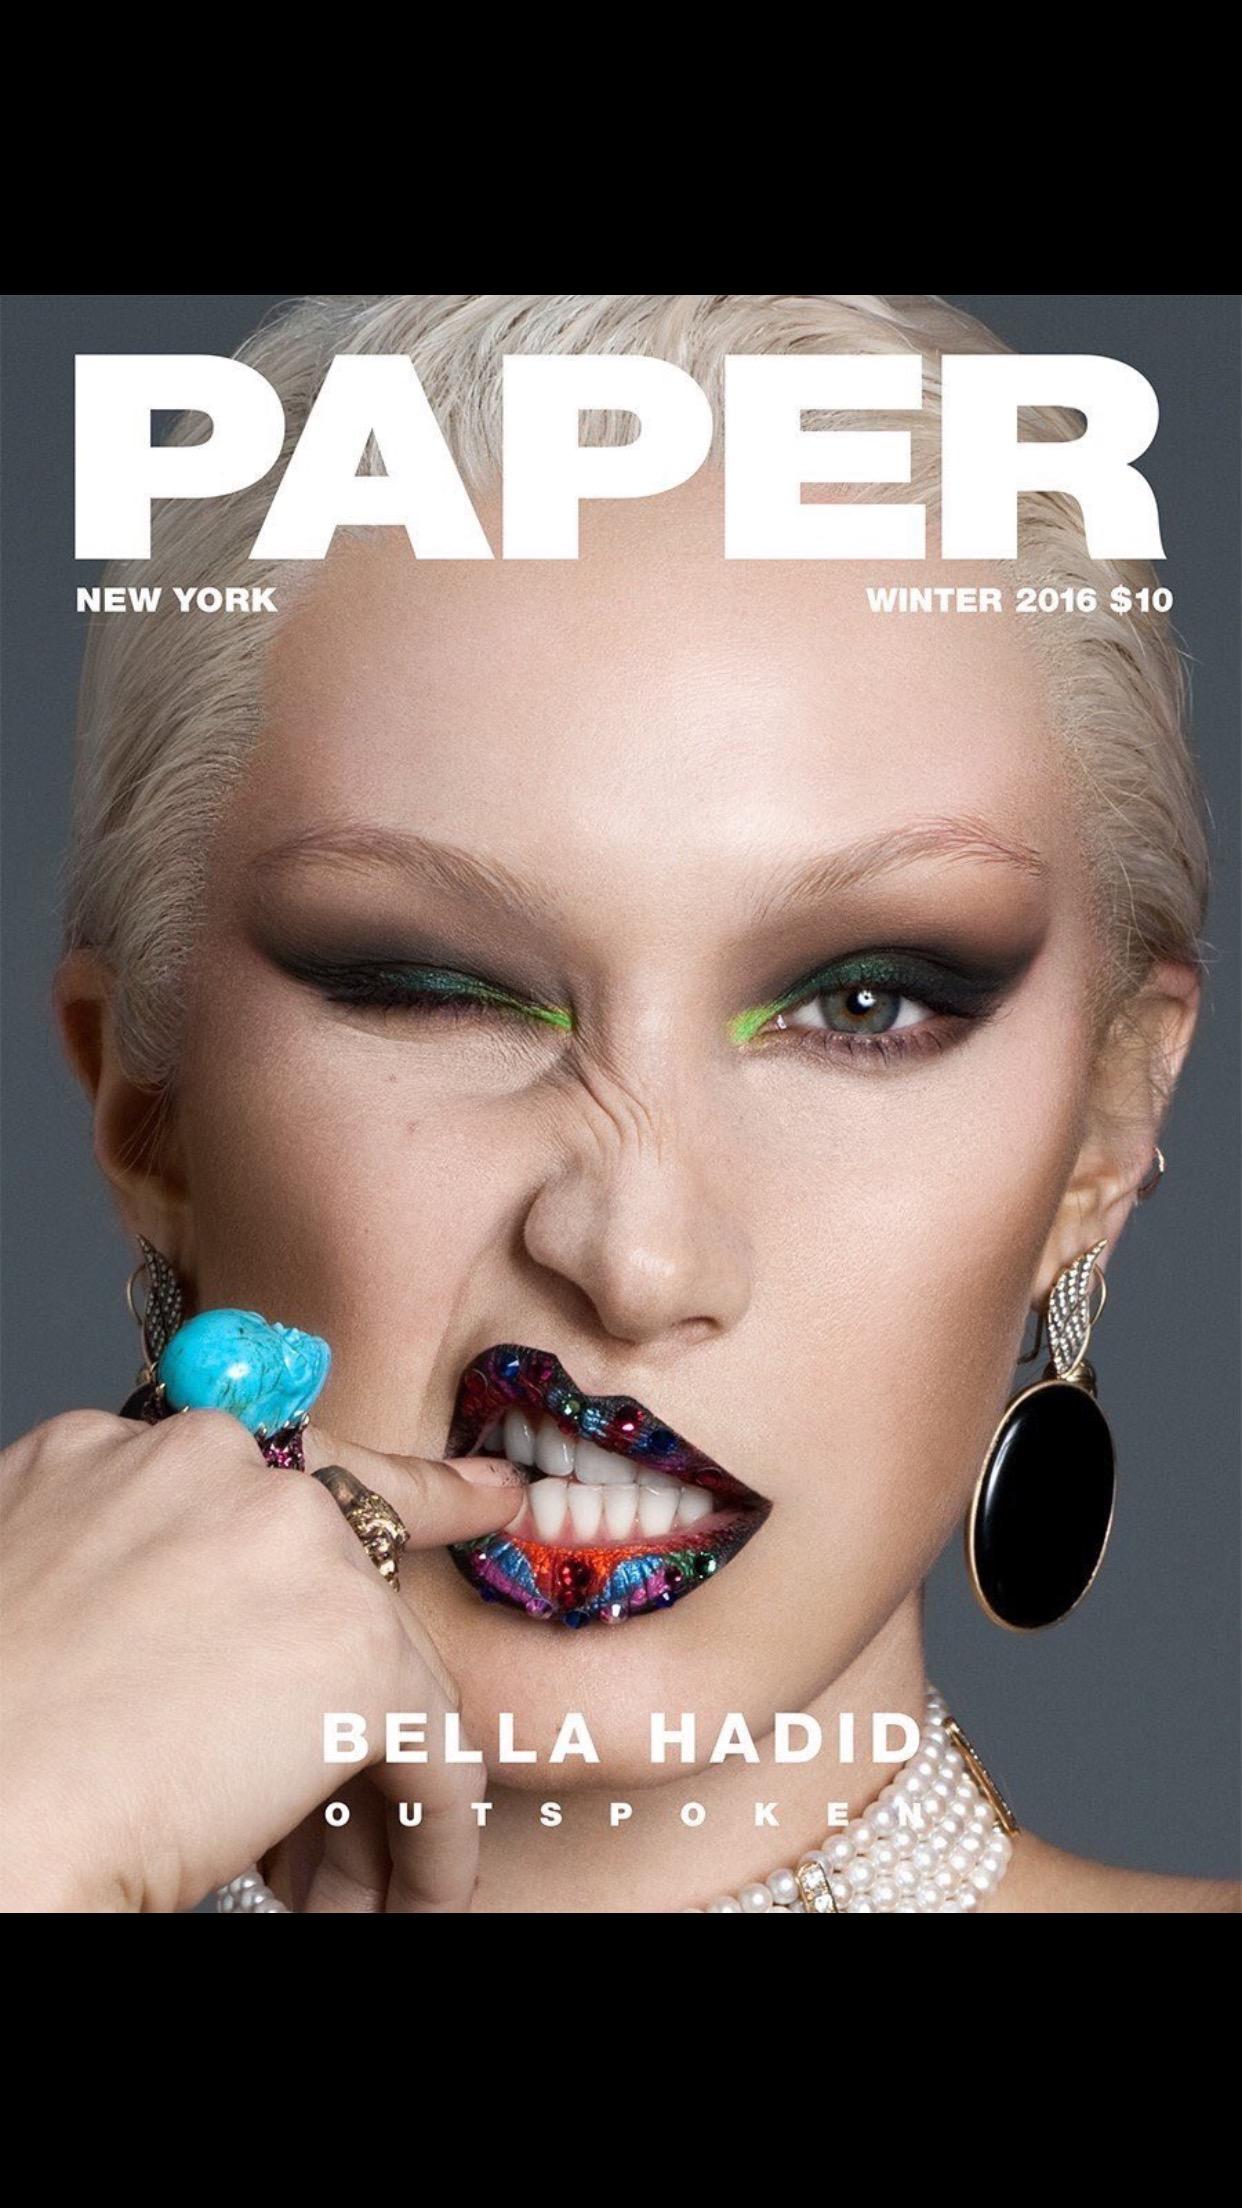 FUCCI steps it up a notch, styles supermodel Bella Hadid